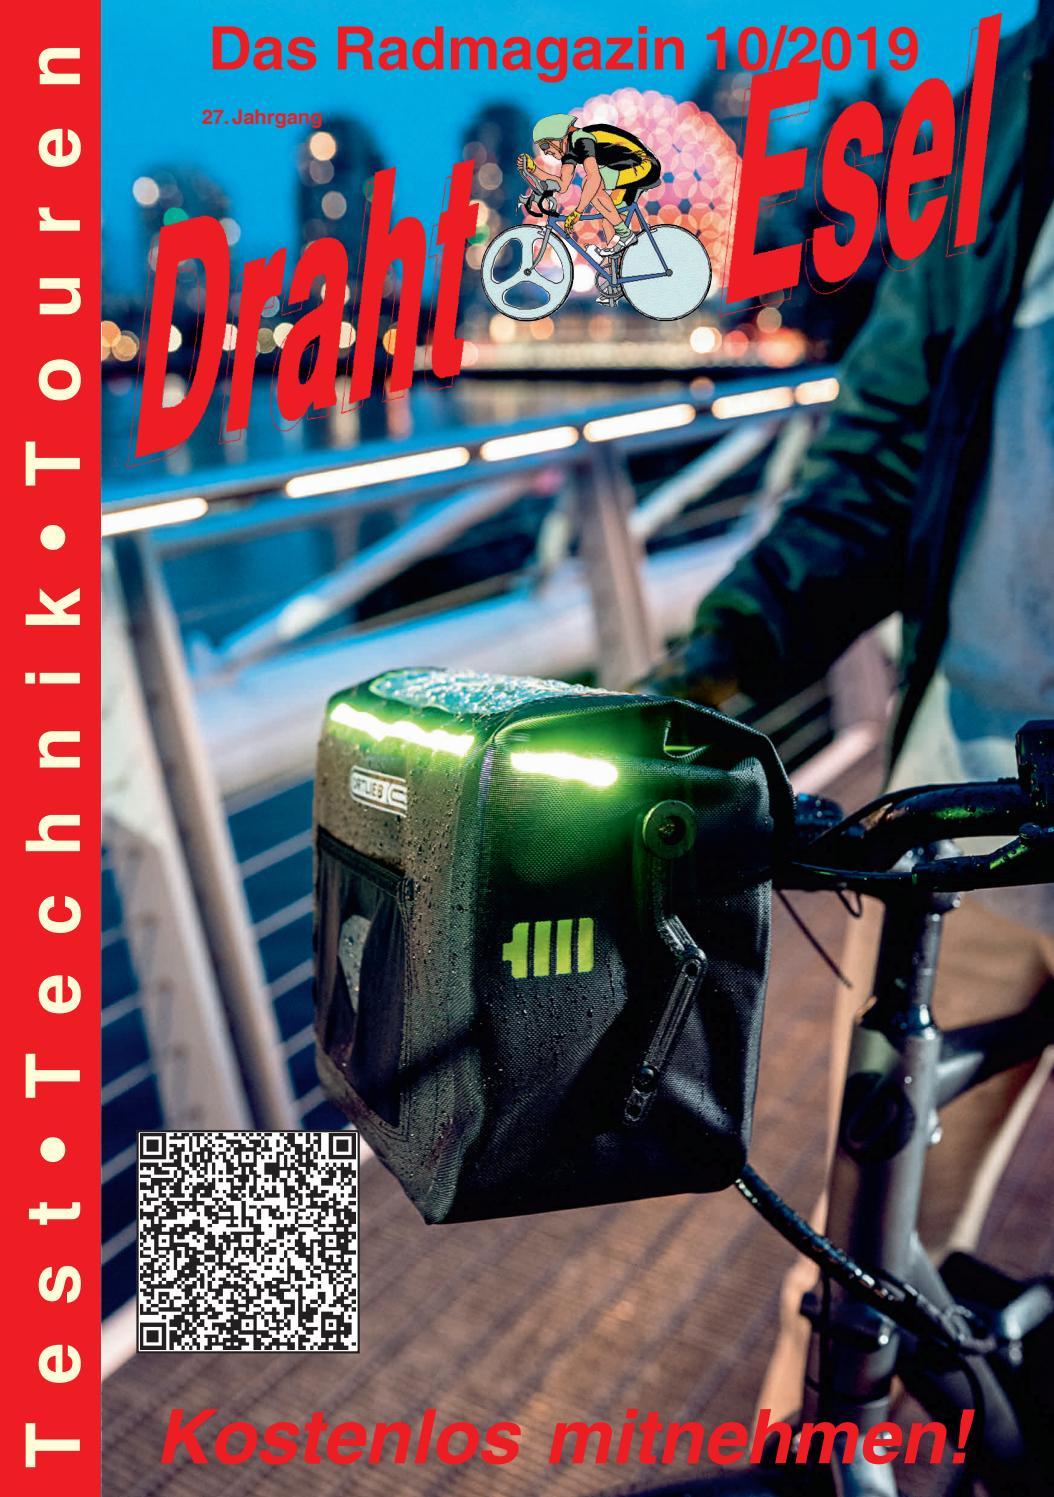 DrahtEsel 10.2019 Das Radmagazin by Humburg Media Group